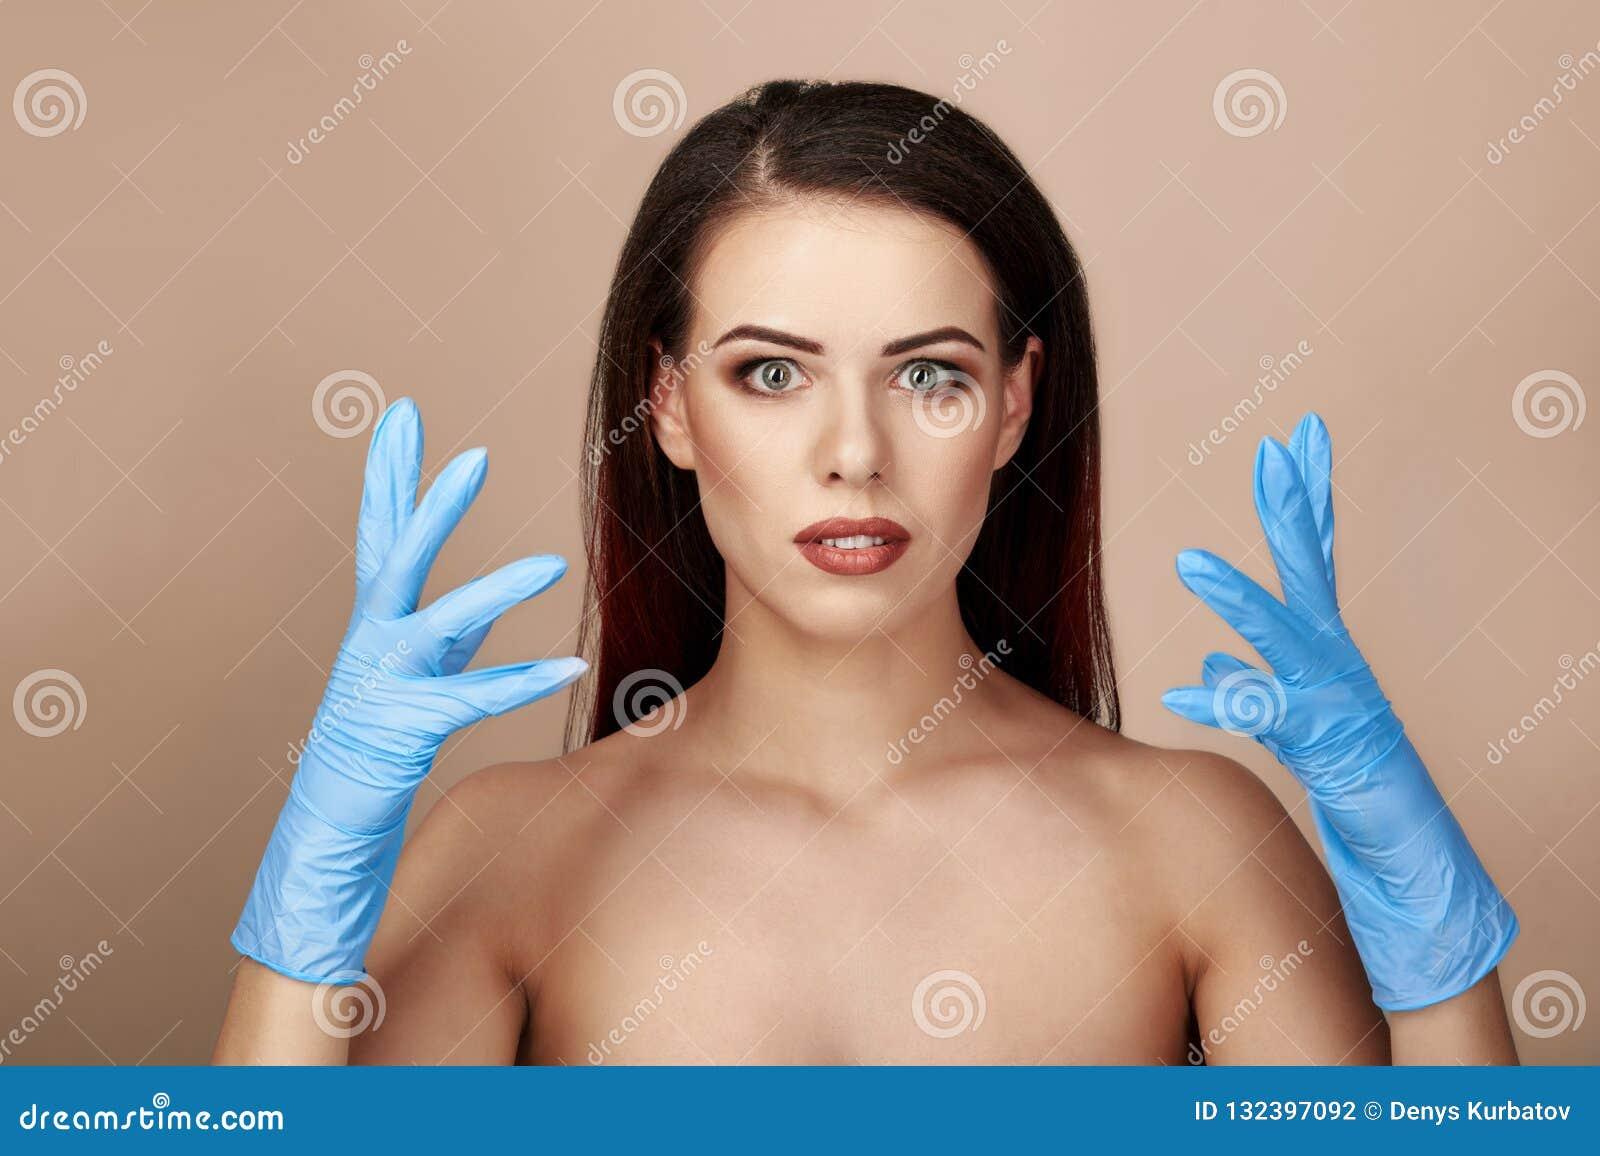 Circumcision fetish penis sensation women preference